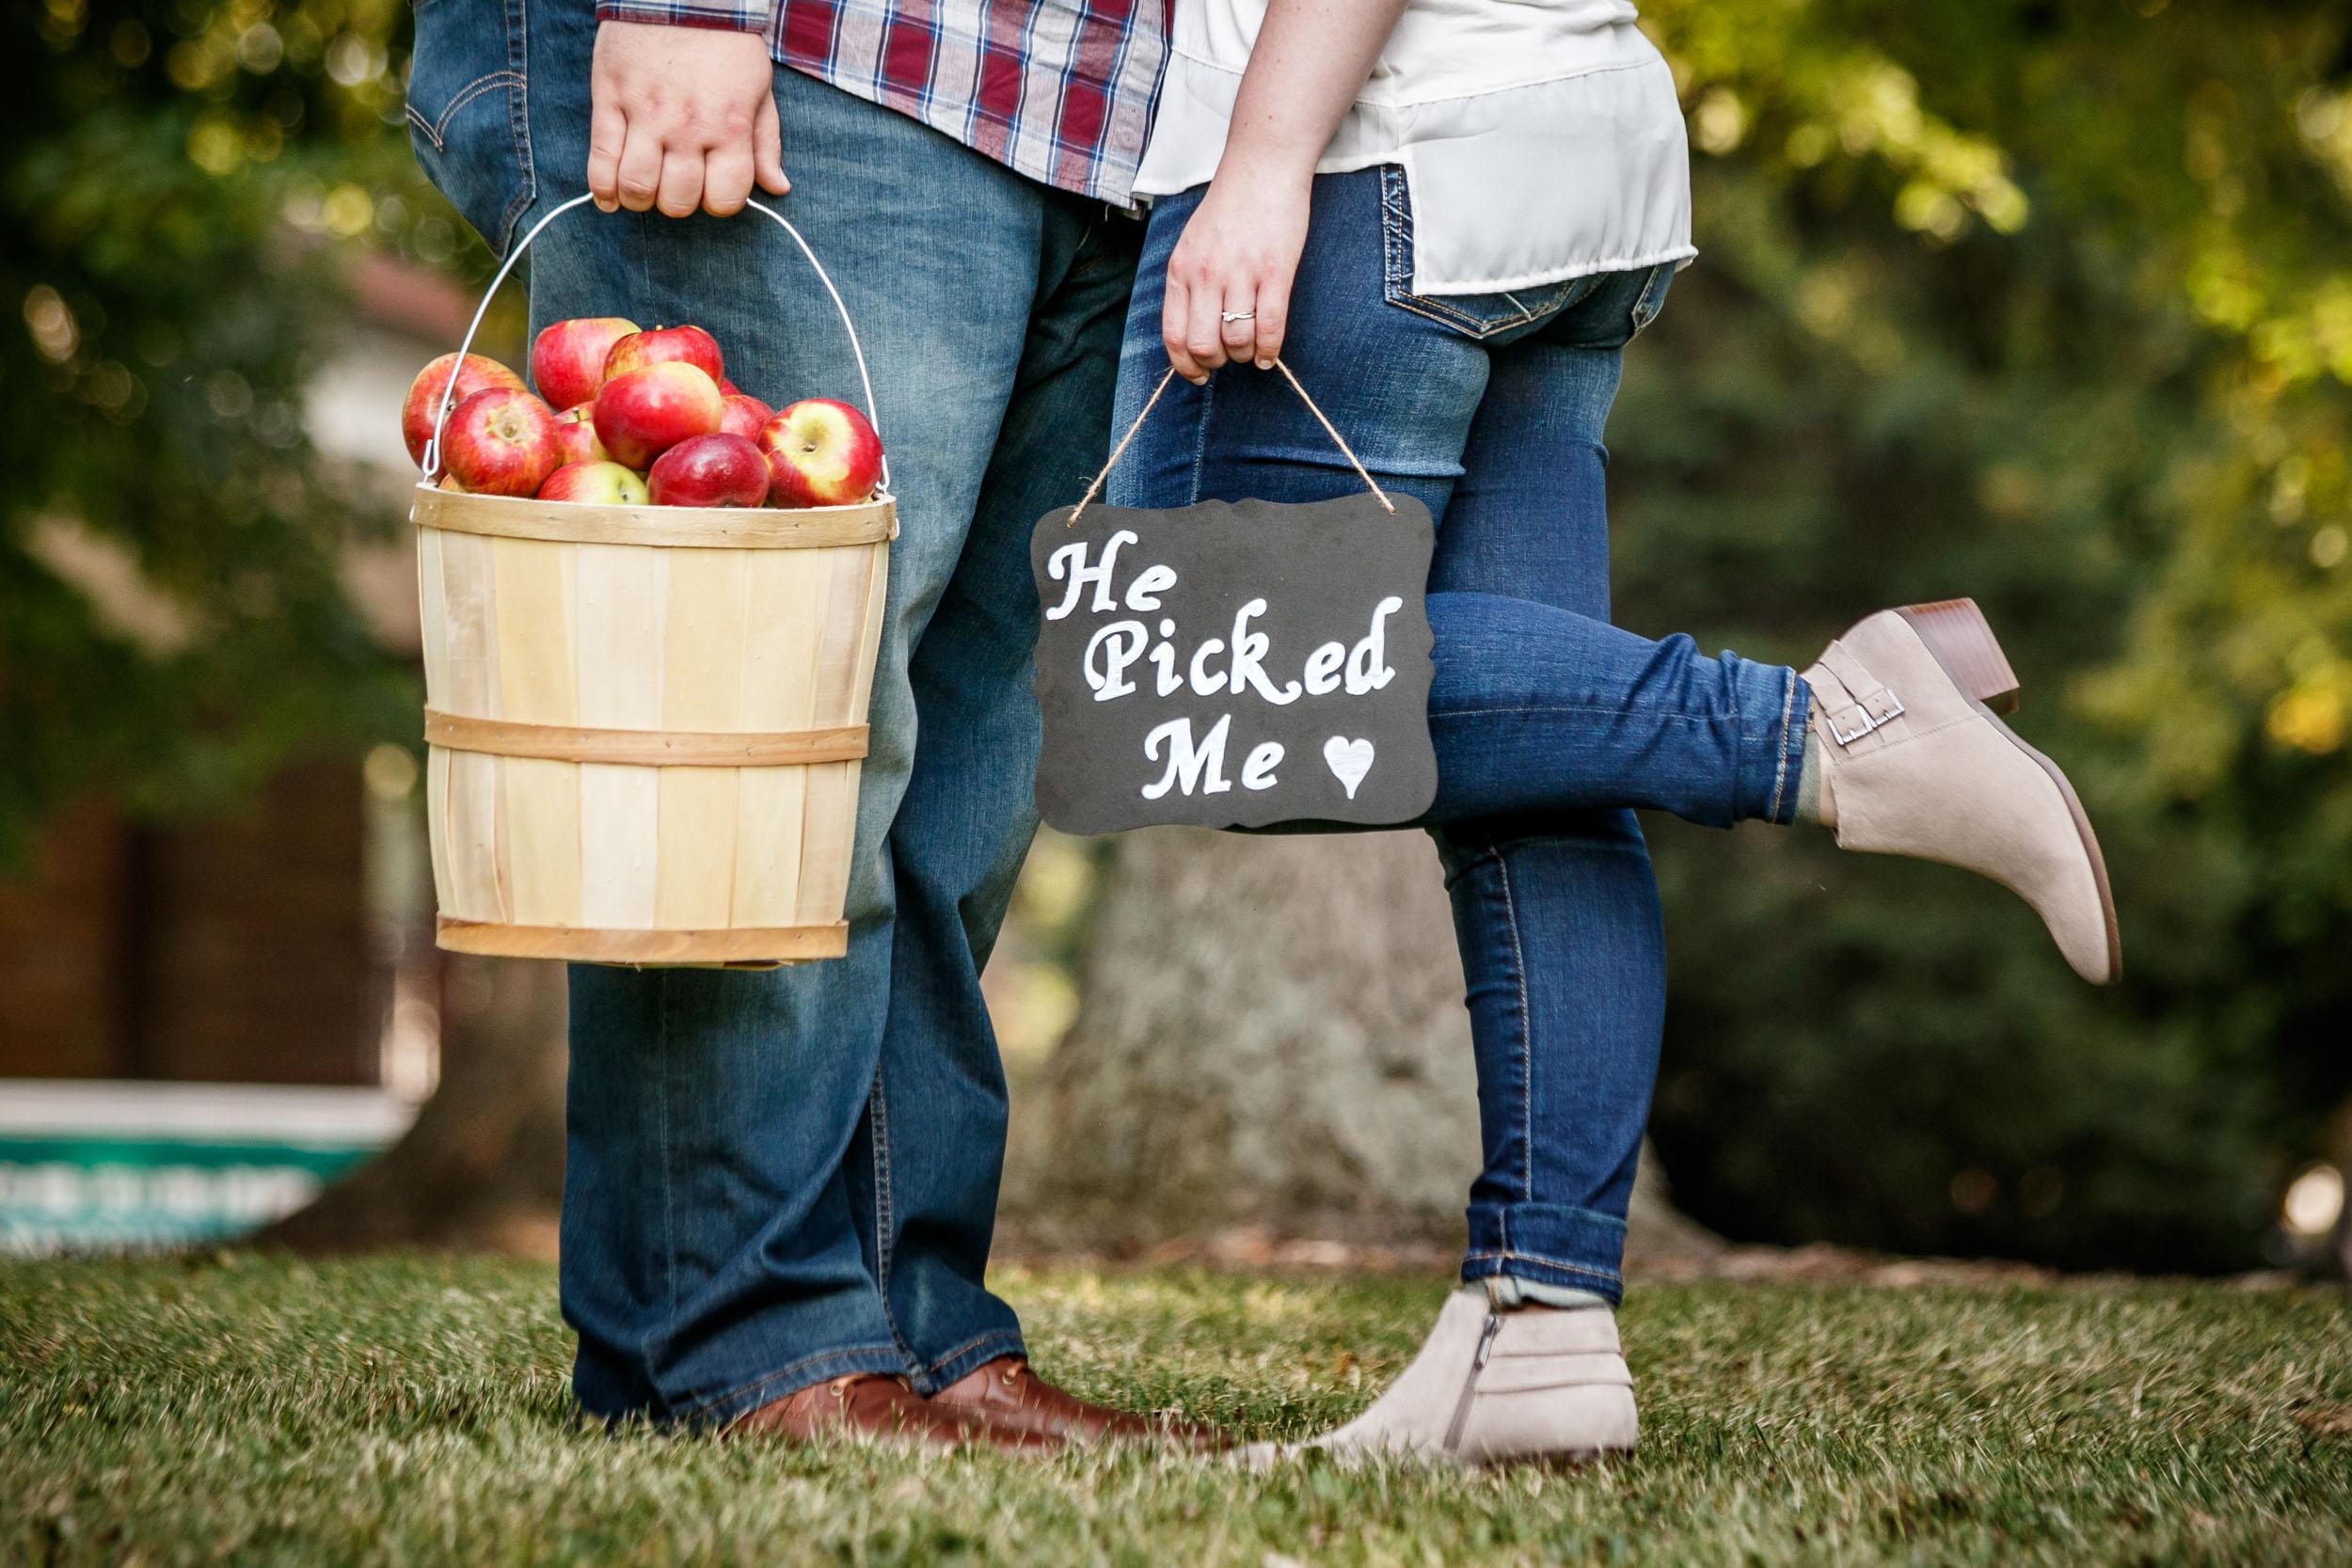 fall-engagement-photos-props--adam-shea-photography-green-bay-appleton-neenah-photographer-17.jpg